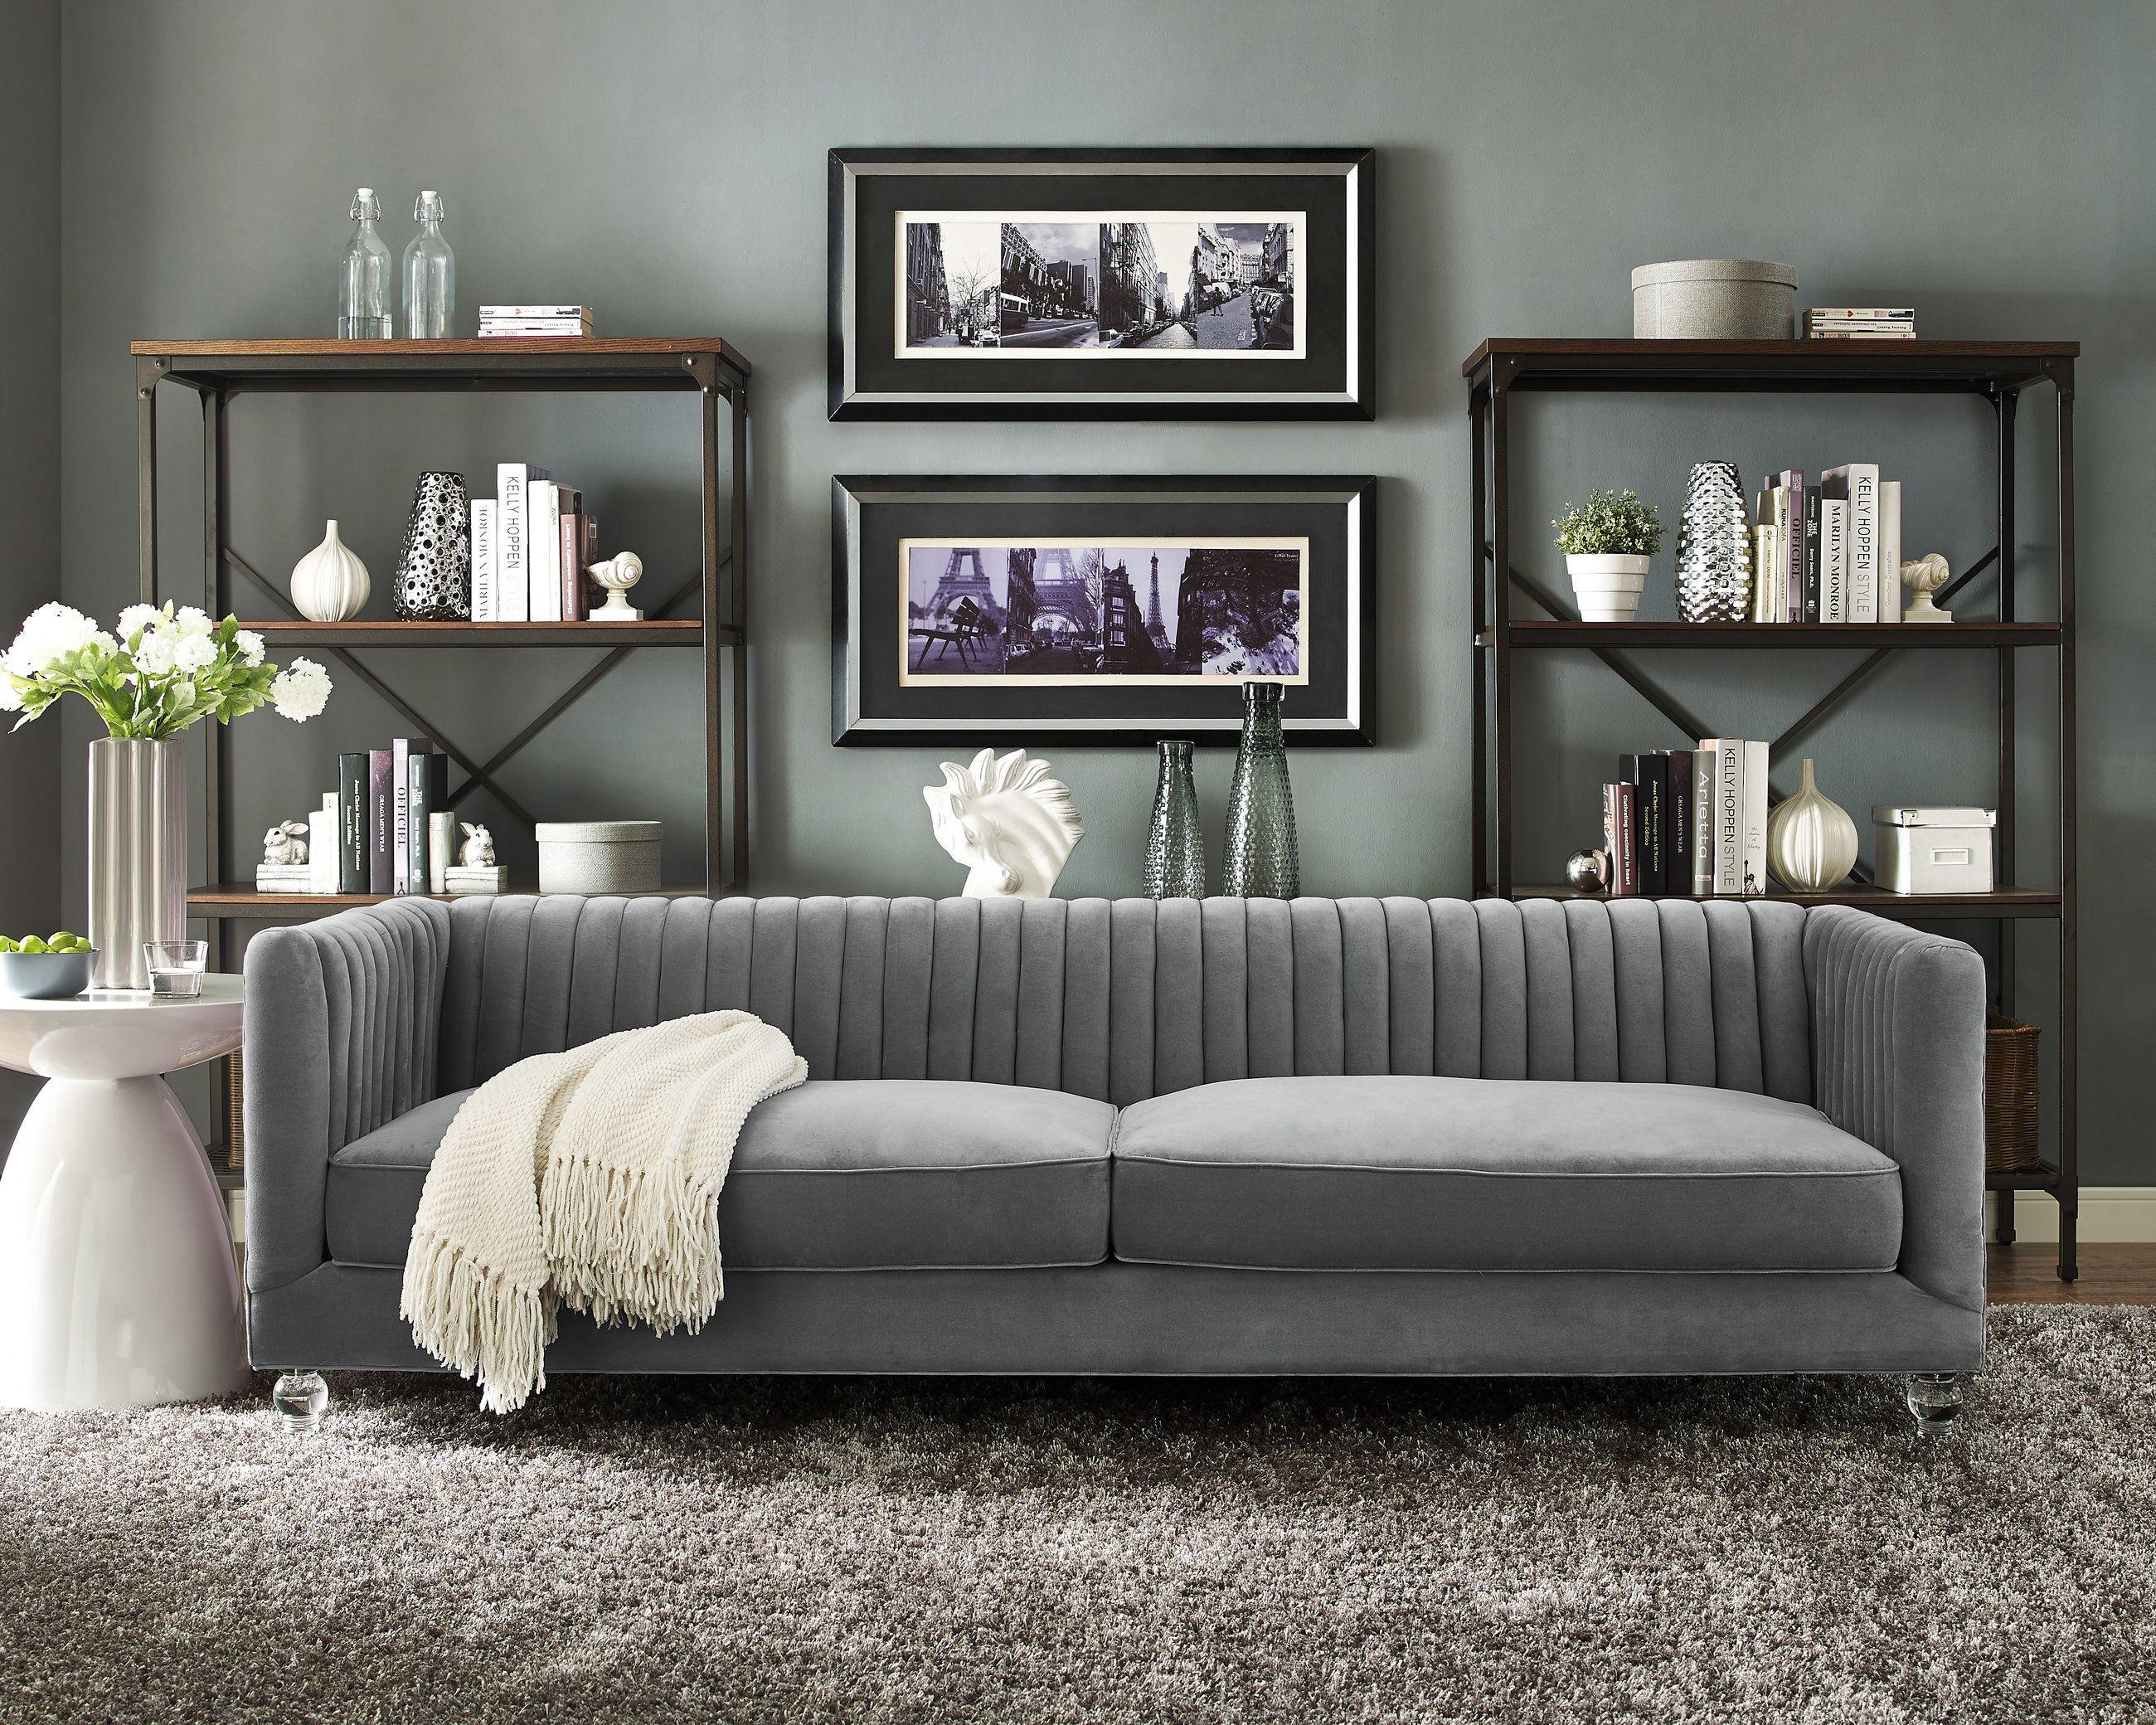 aviator grey velvet sofa from tov tov s86 coleman. Black Bedroom Furniture Sets. Home Design Ideas